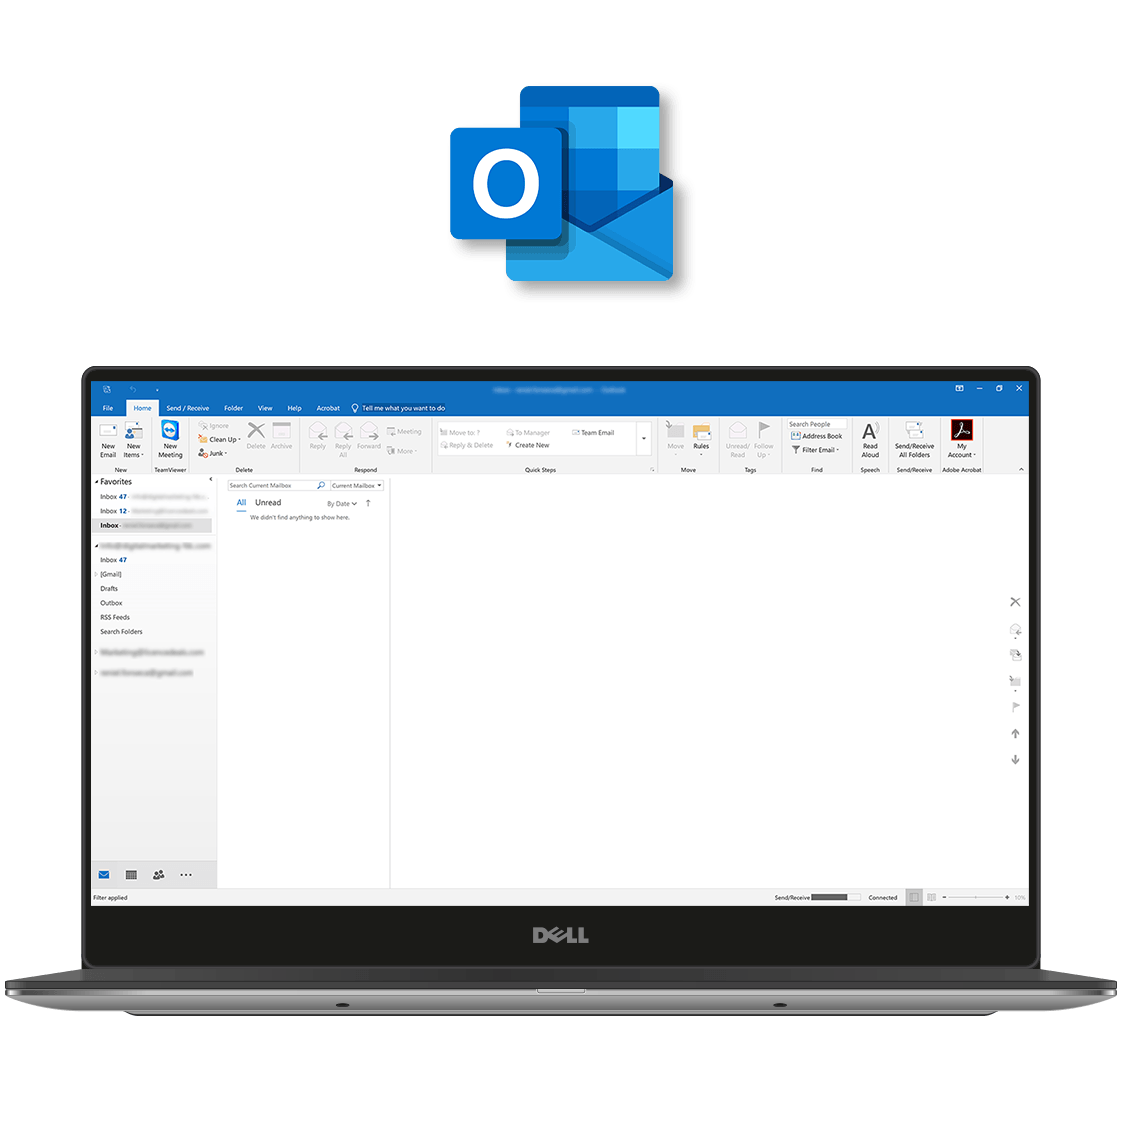 OUtlook 2019 download licence instant-key.com